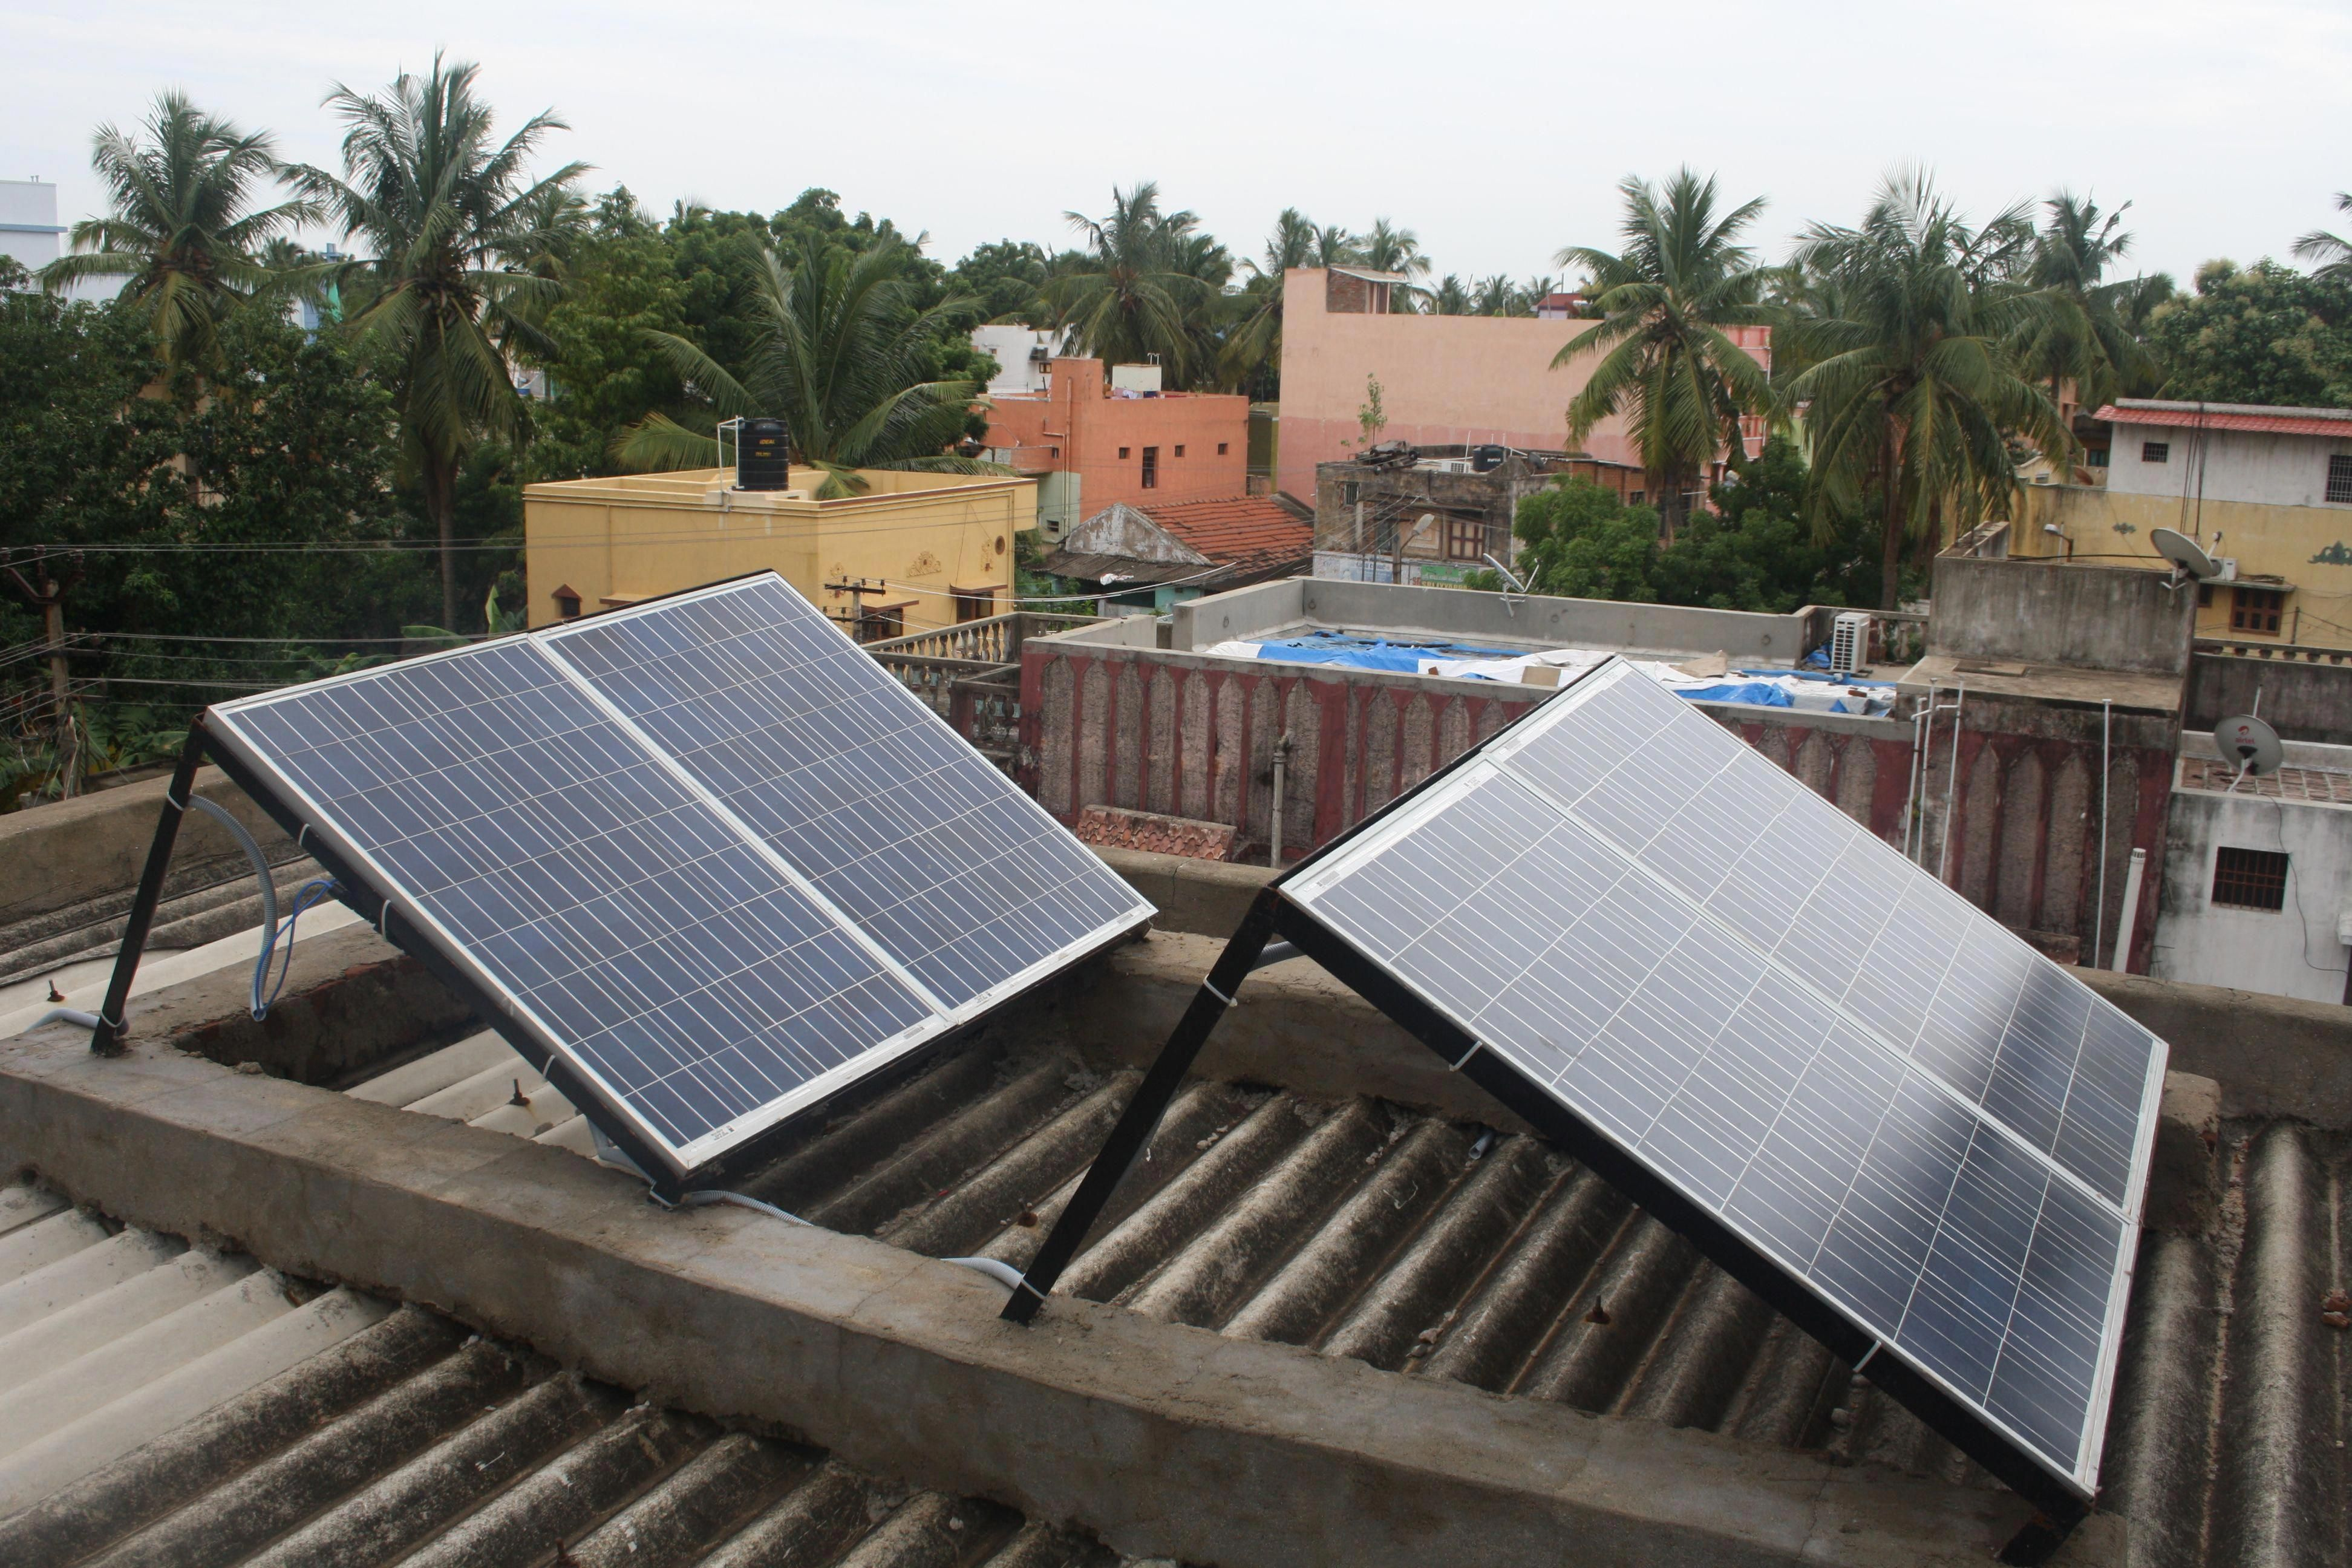 Solar Panel Manufacturers In Chennai Solar Water Heaters In Chennai Solar Pv Modules In Chennai Solar Heate Solar Energy Panels Solar Solar Panel Manufacturers